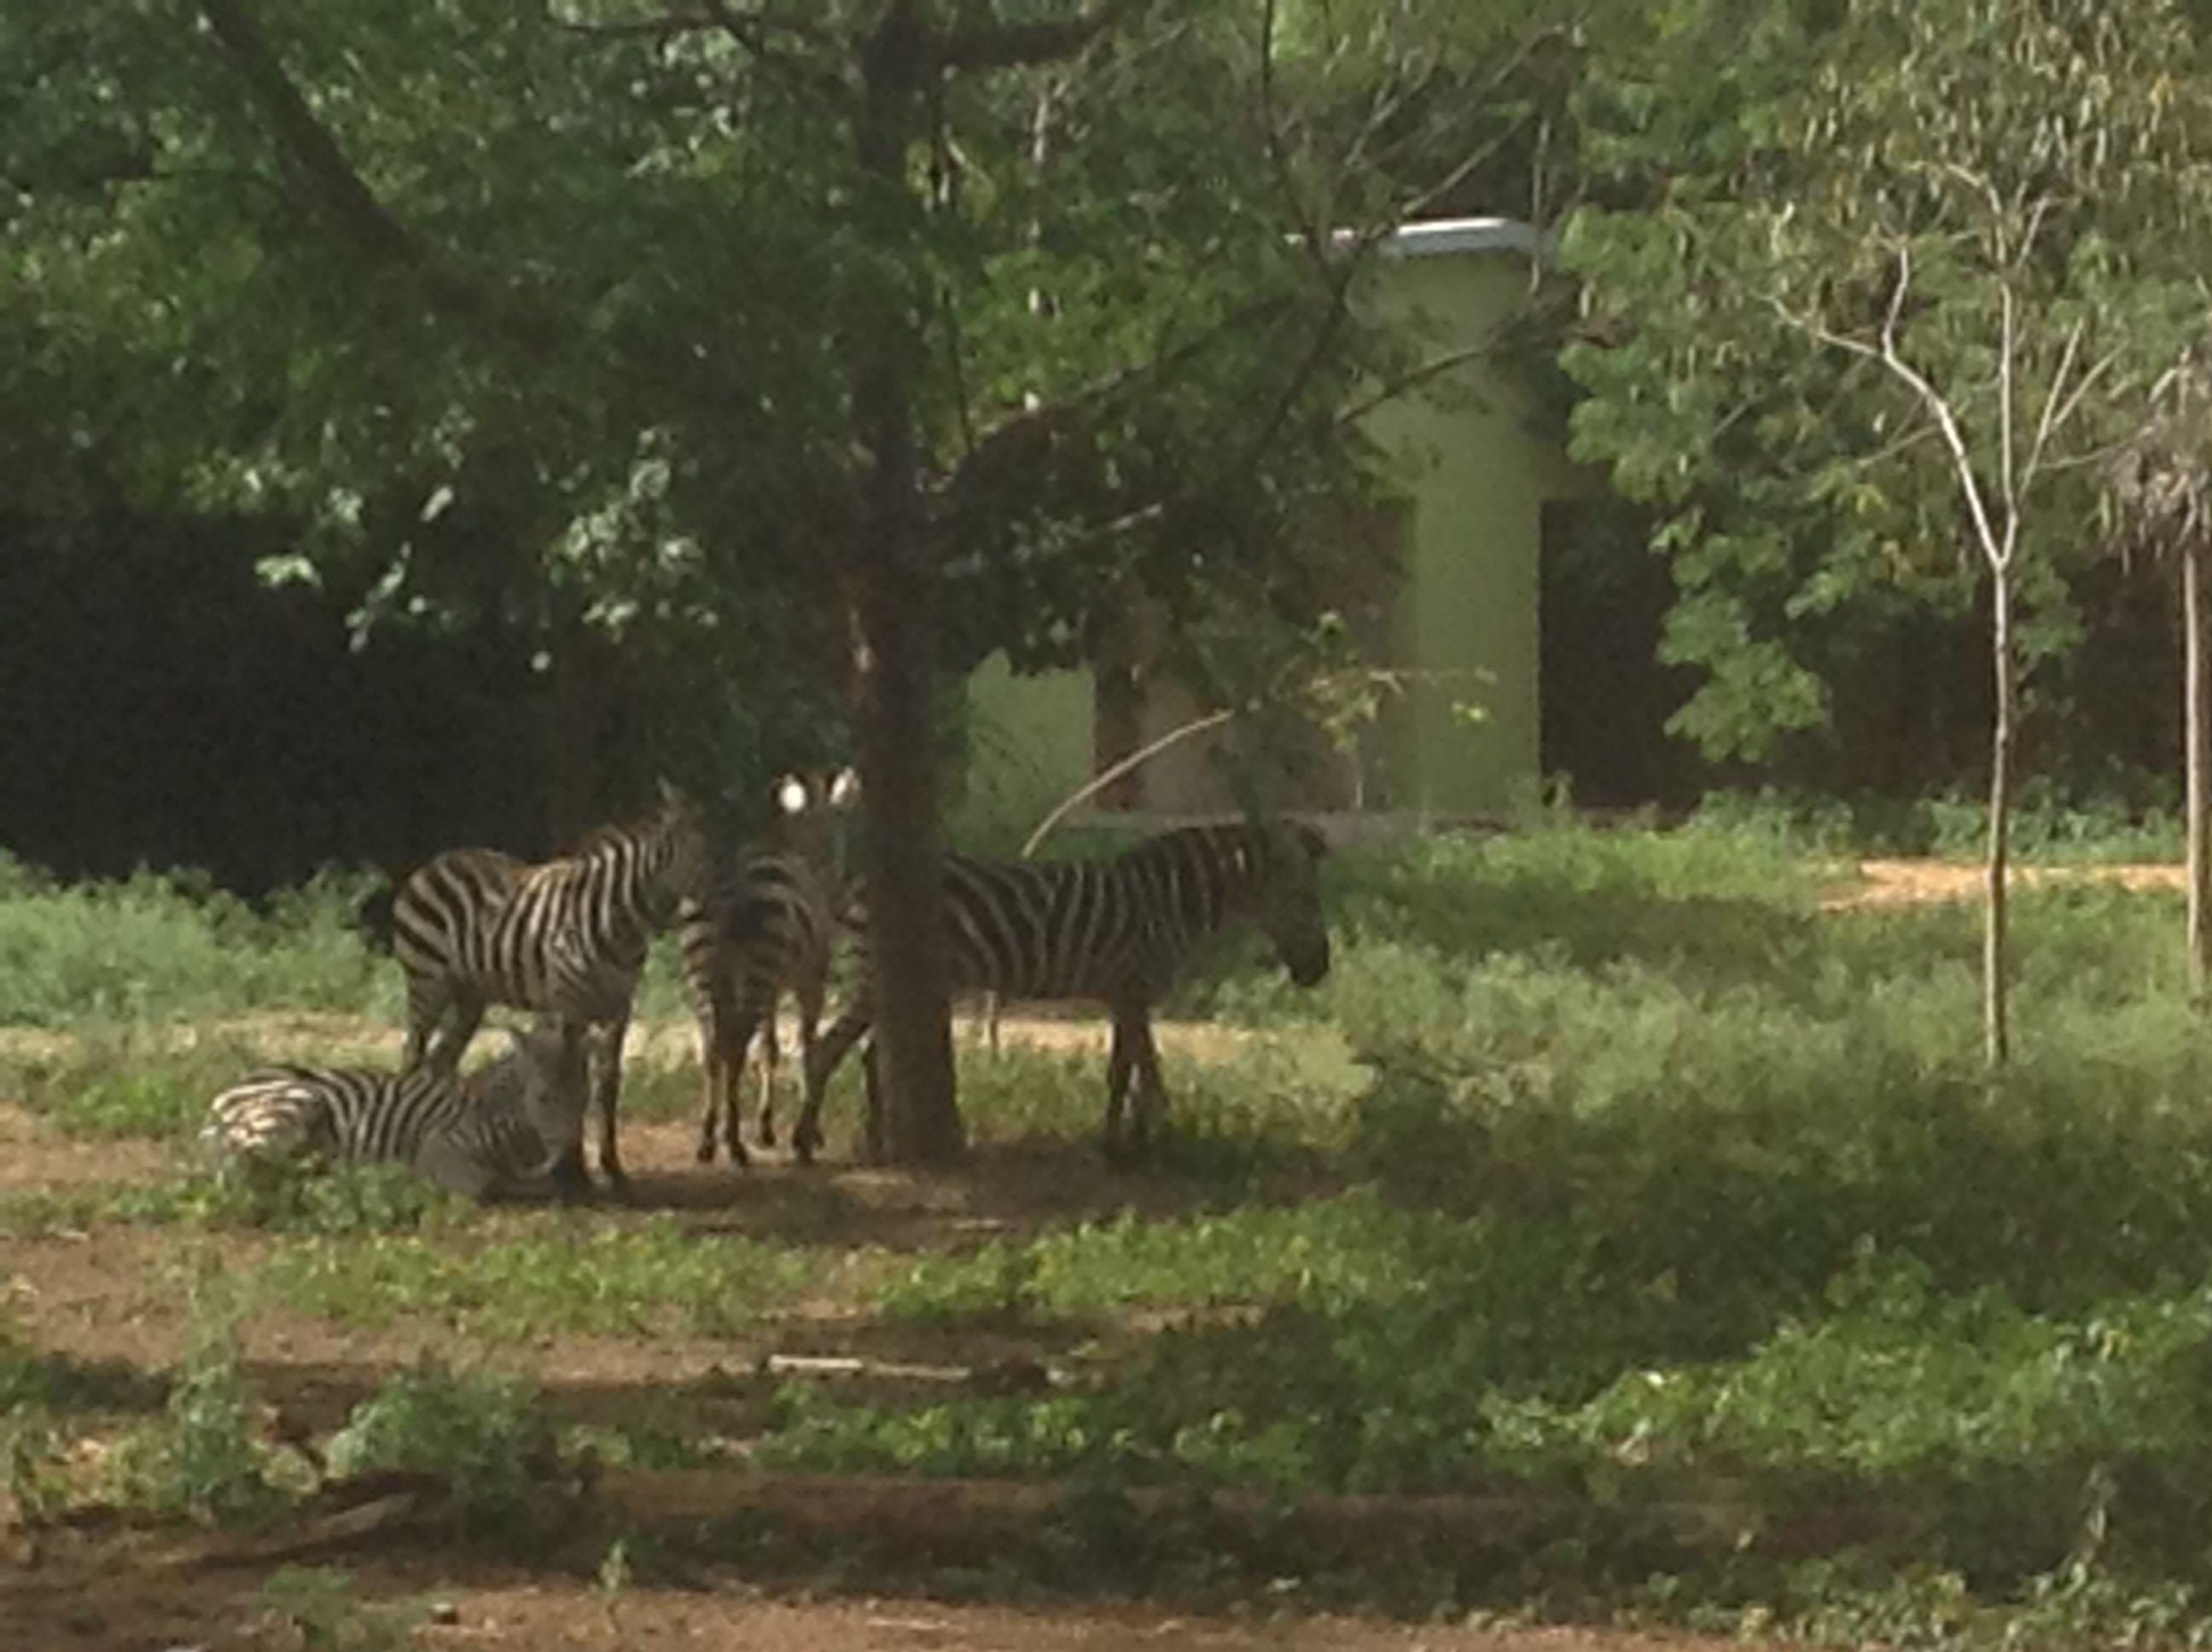 54ef11faafdbb90650f4ce96fd706a1b - Mysore Zoo Sri Chamarajendra Zoological Gardens